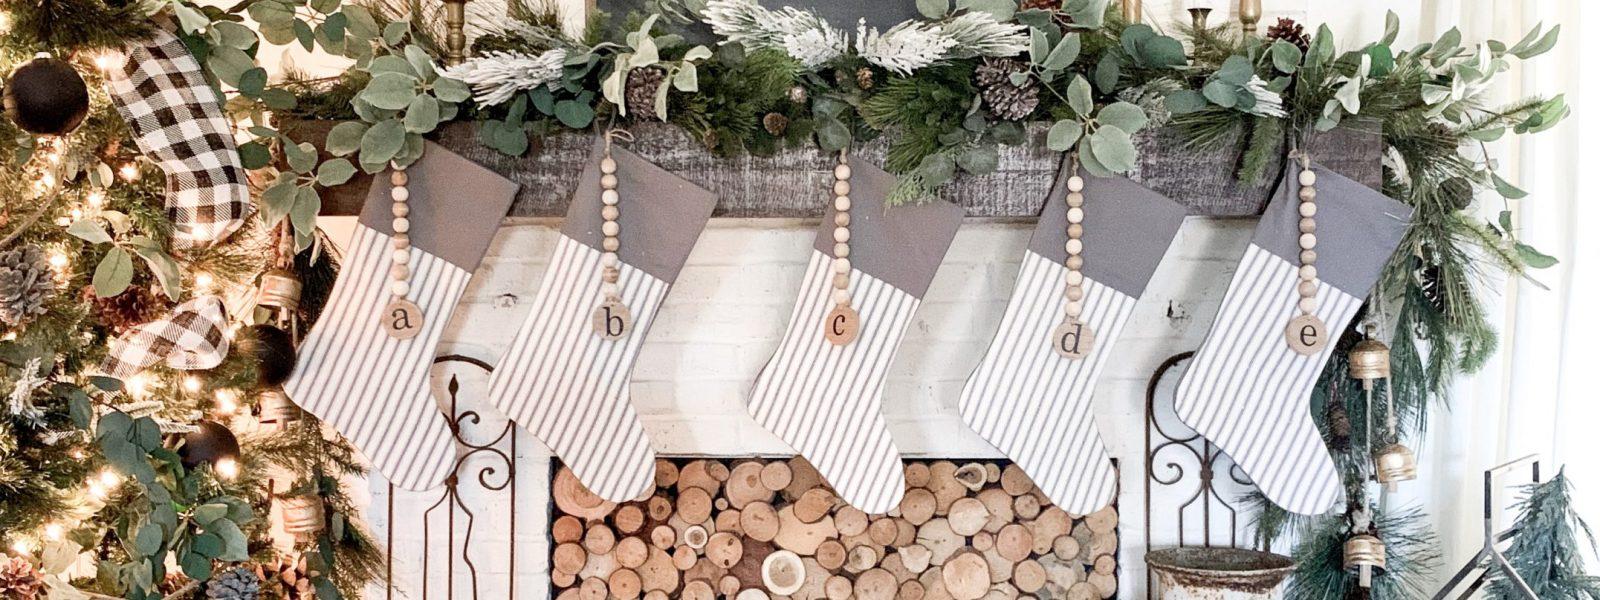 Cozy Christmas Living Room and Neutral Decor